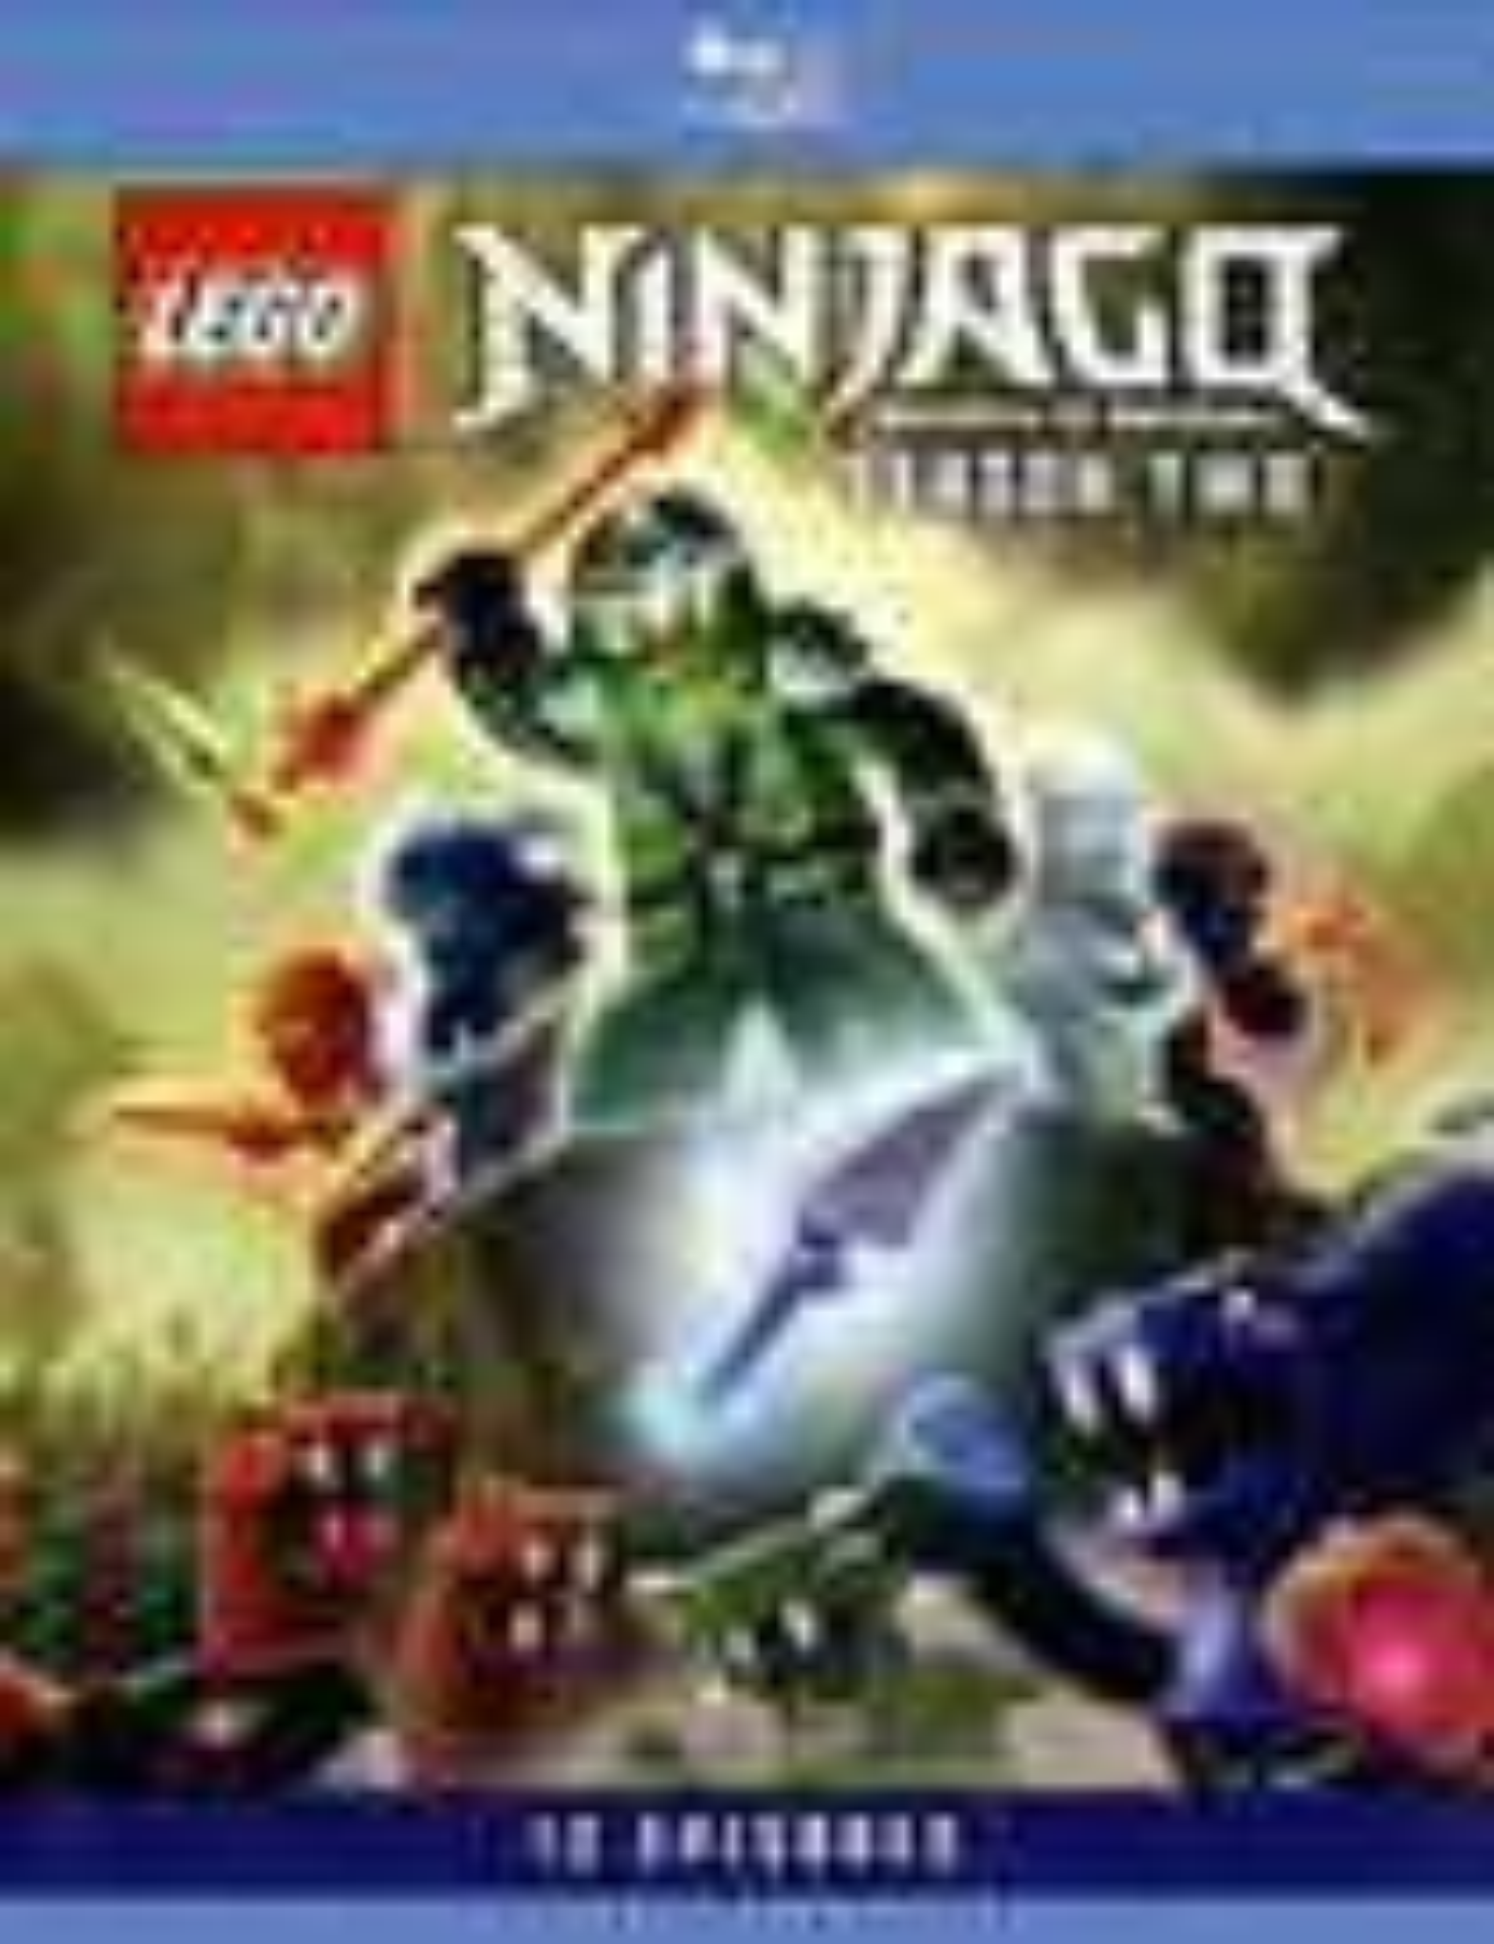 Lego Ninjago: Masters Of Spinjitzu - Season Two [2 Discs] [blu-ray] 8578045